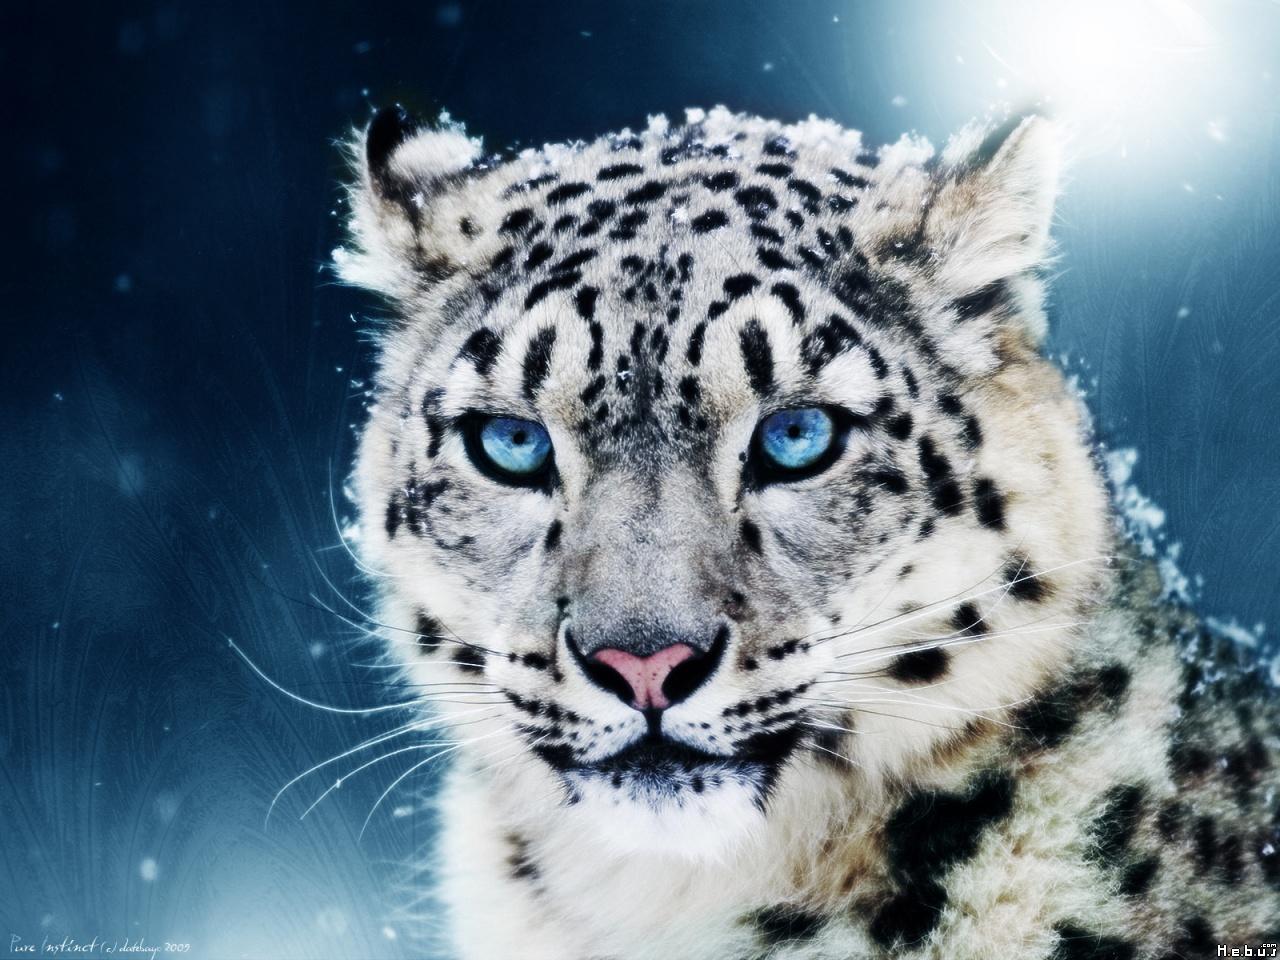 Tiger 2 siberian or amur tiger 1 WHITE TIGER 35 White Tiger Cubs 1280x960